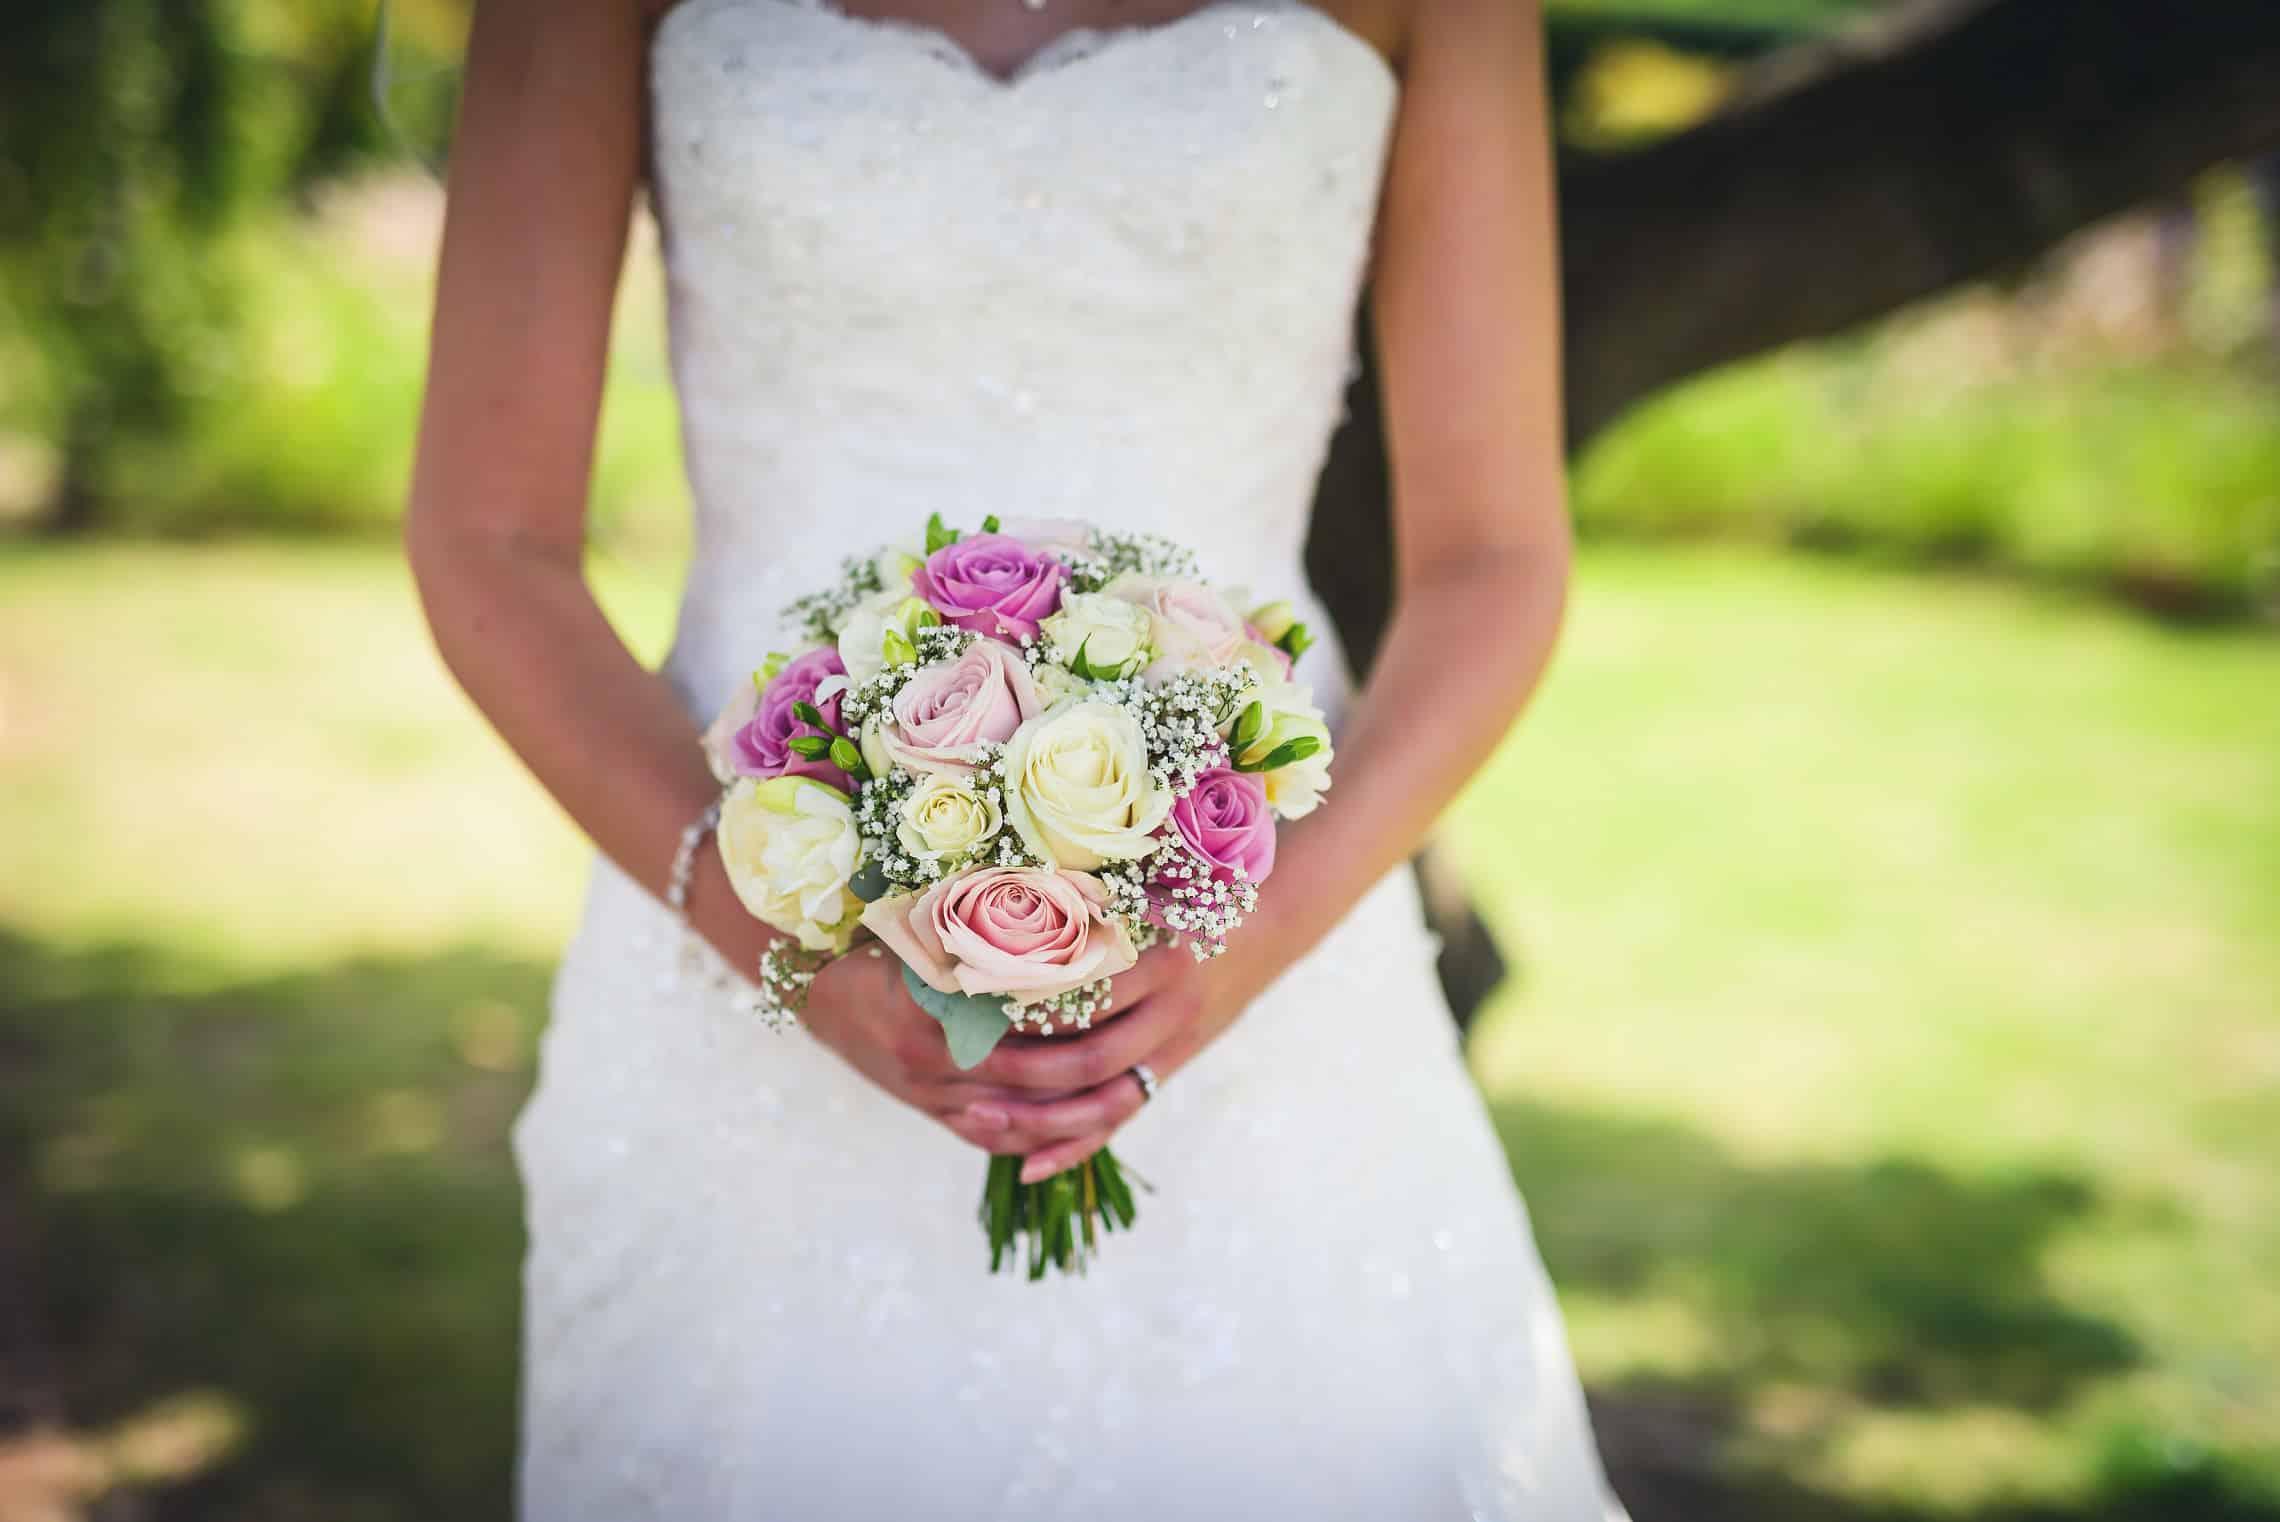 gaynes_park_wedding_lm_justin_bailey_photography_012